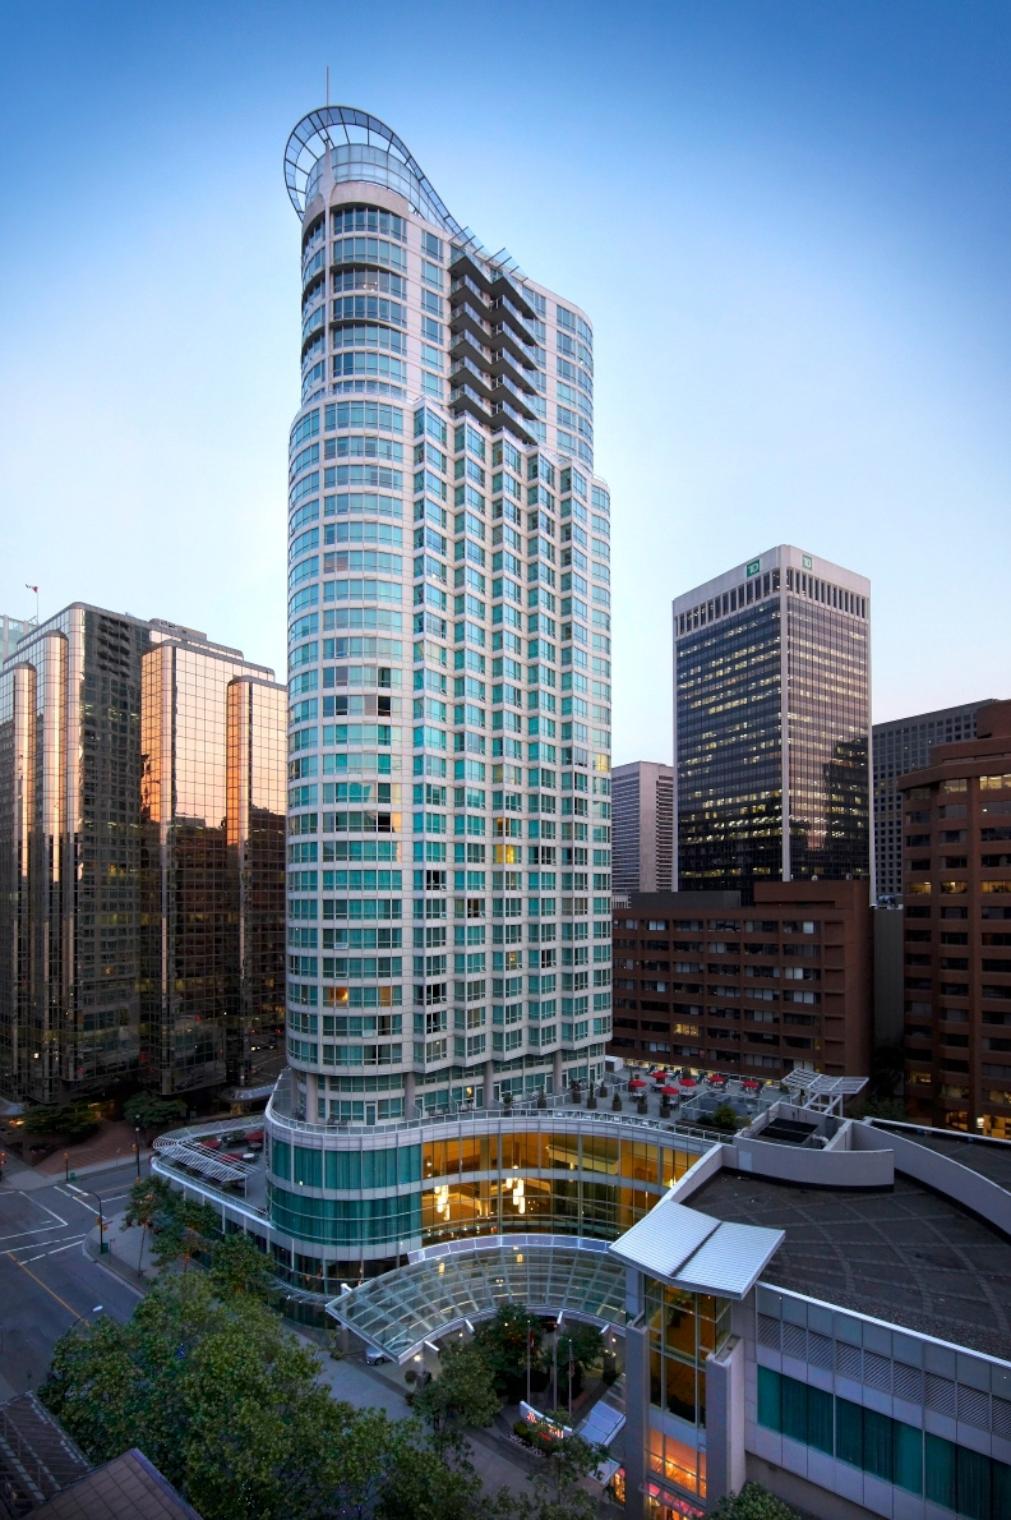 Vancouver Marriott Pinnacle Hotel - Vancouver